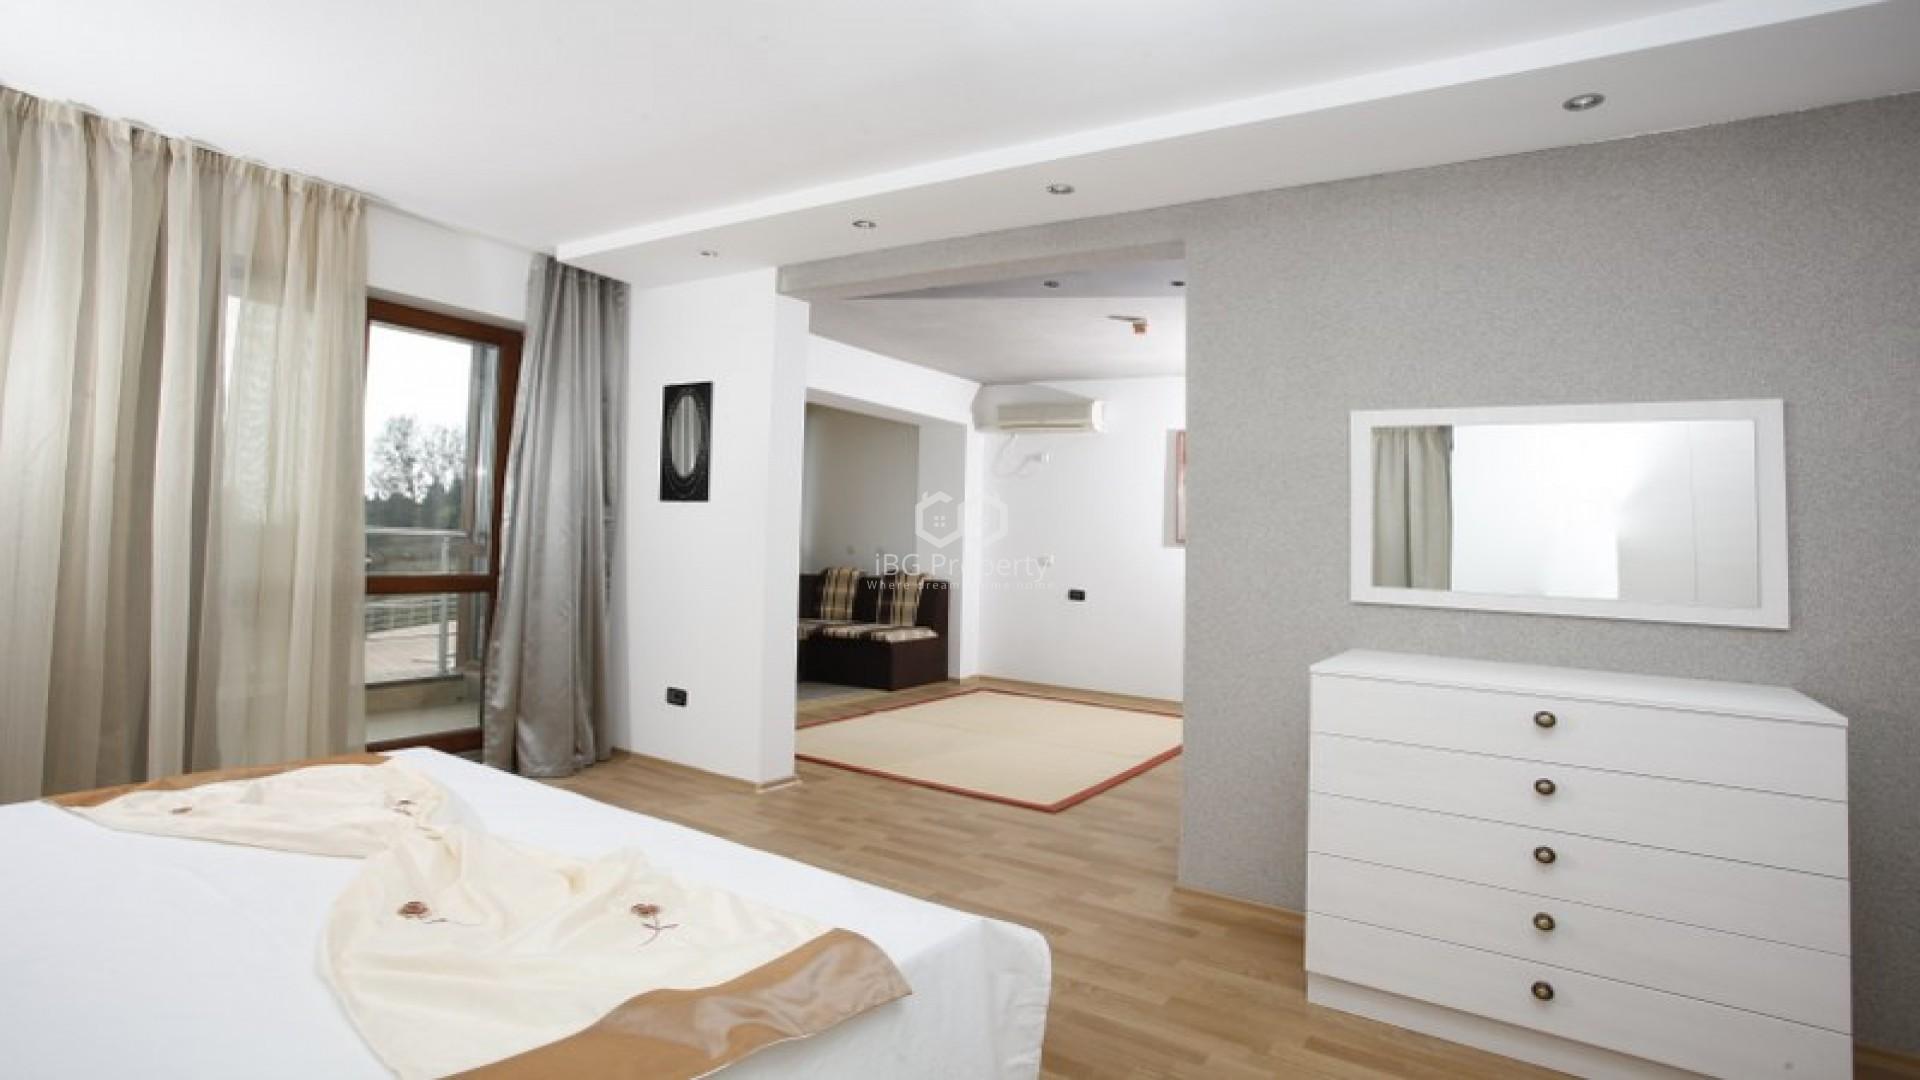 ЭКСКЛЮЗИВНОЕ ПРЕДЛОЖЕНИЕ! Двухкомнатная квартира Бяла  75 m2